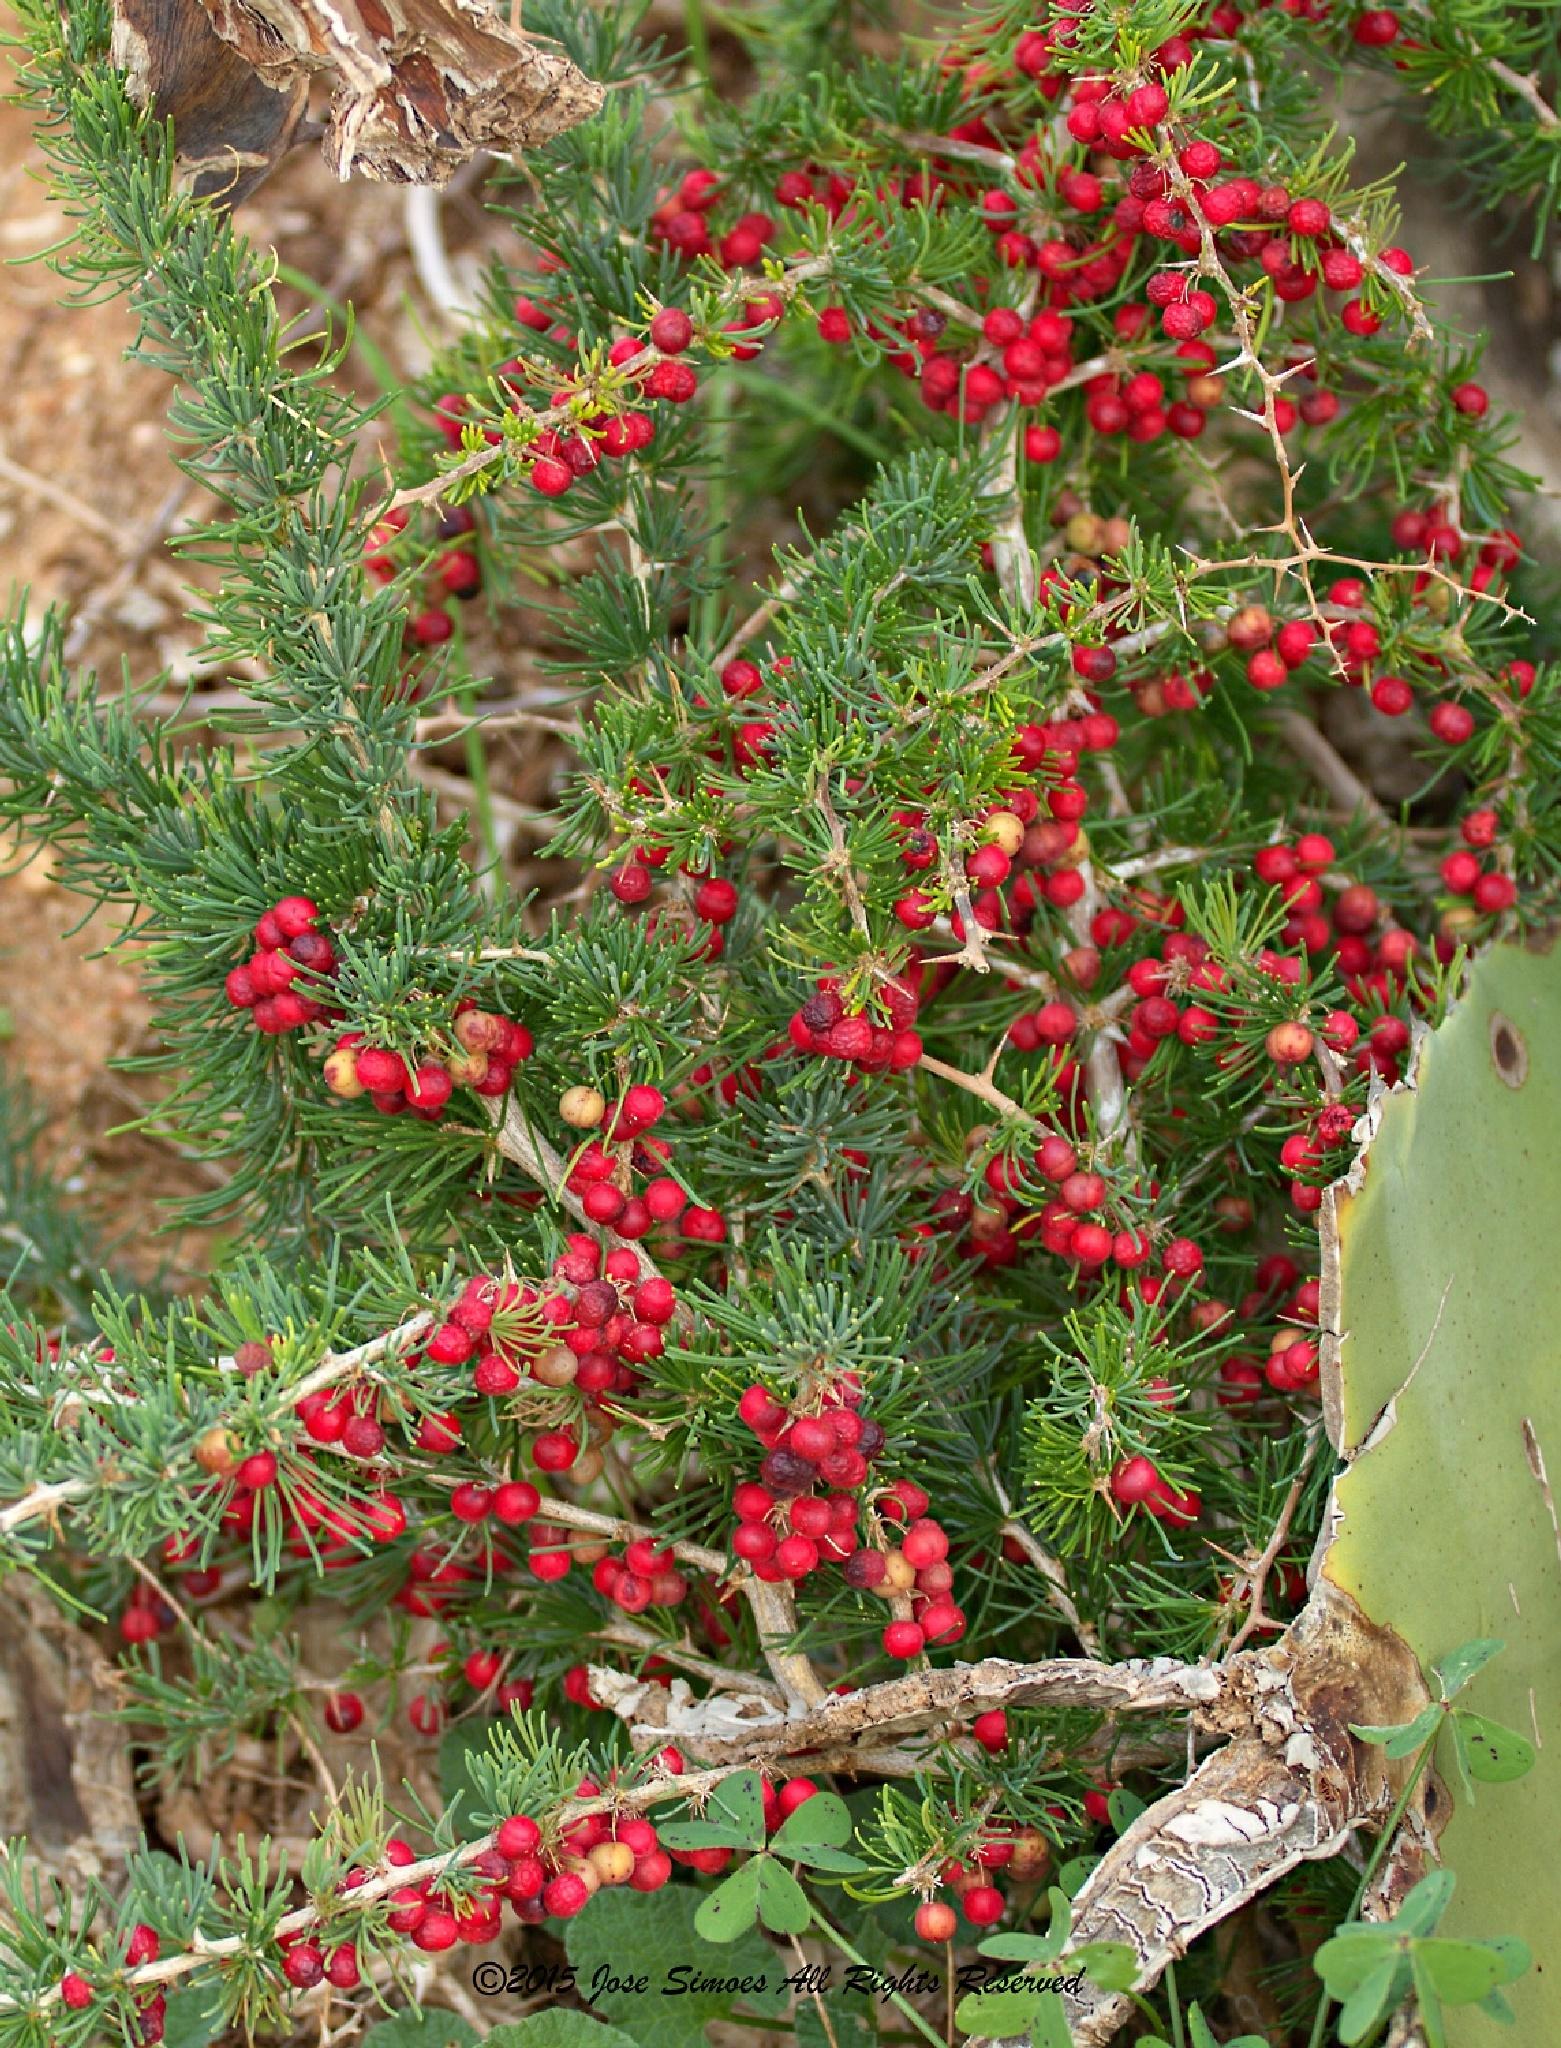 red berries by Jose Simoes